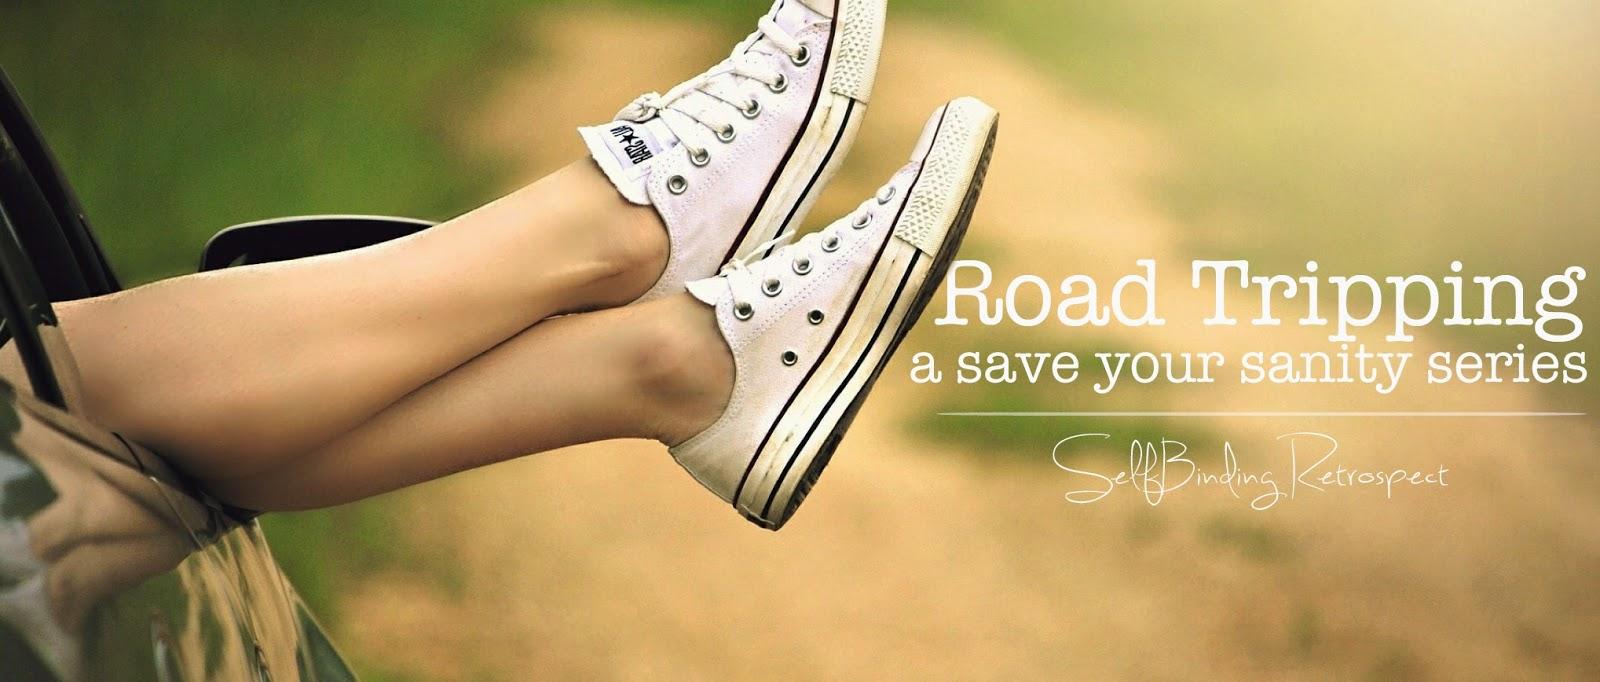 http://selfbindingretrospect.alannarusnak.com/2015/03/road-tripping-save-your-sanity-series.html